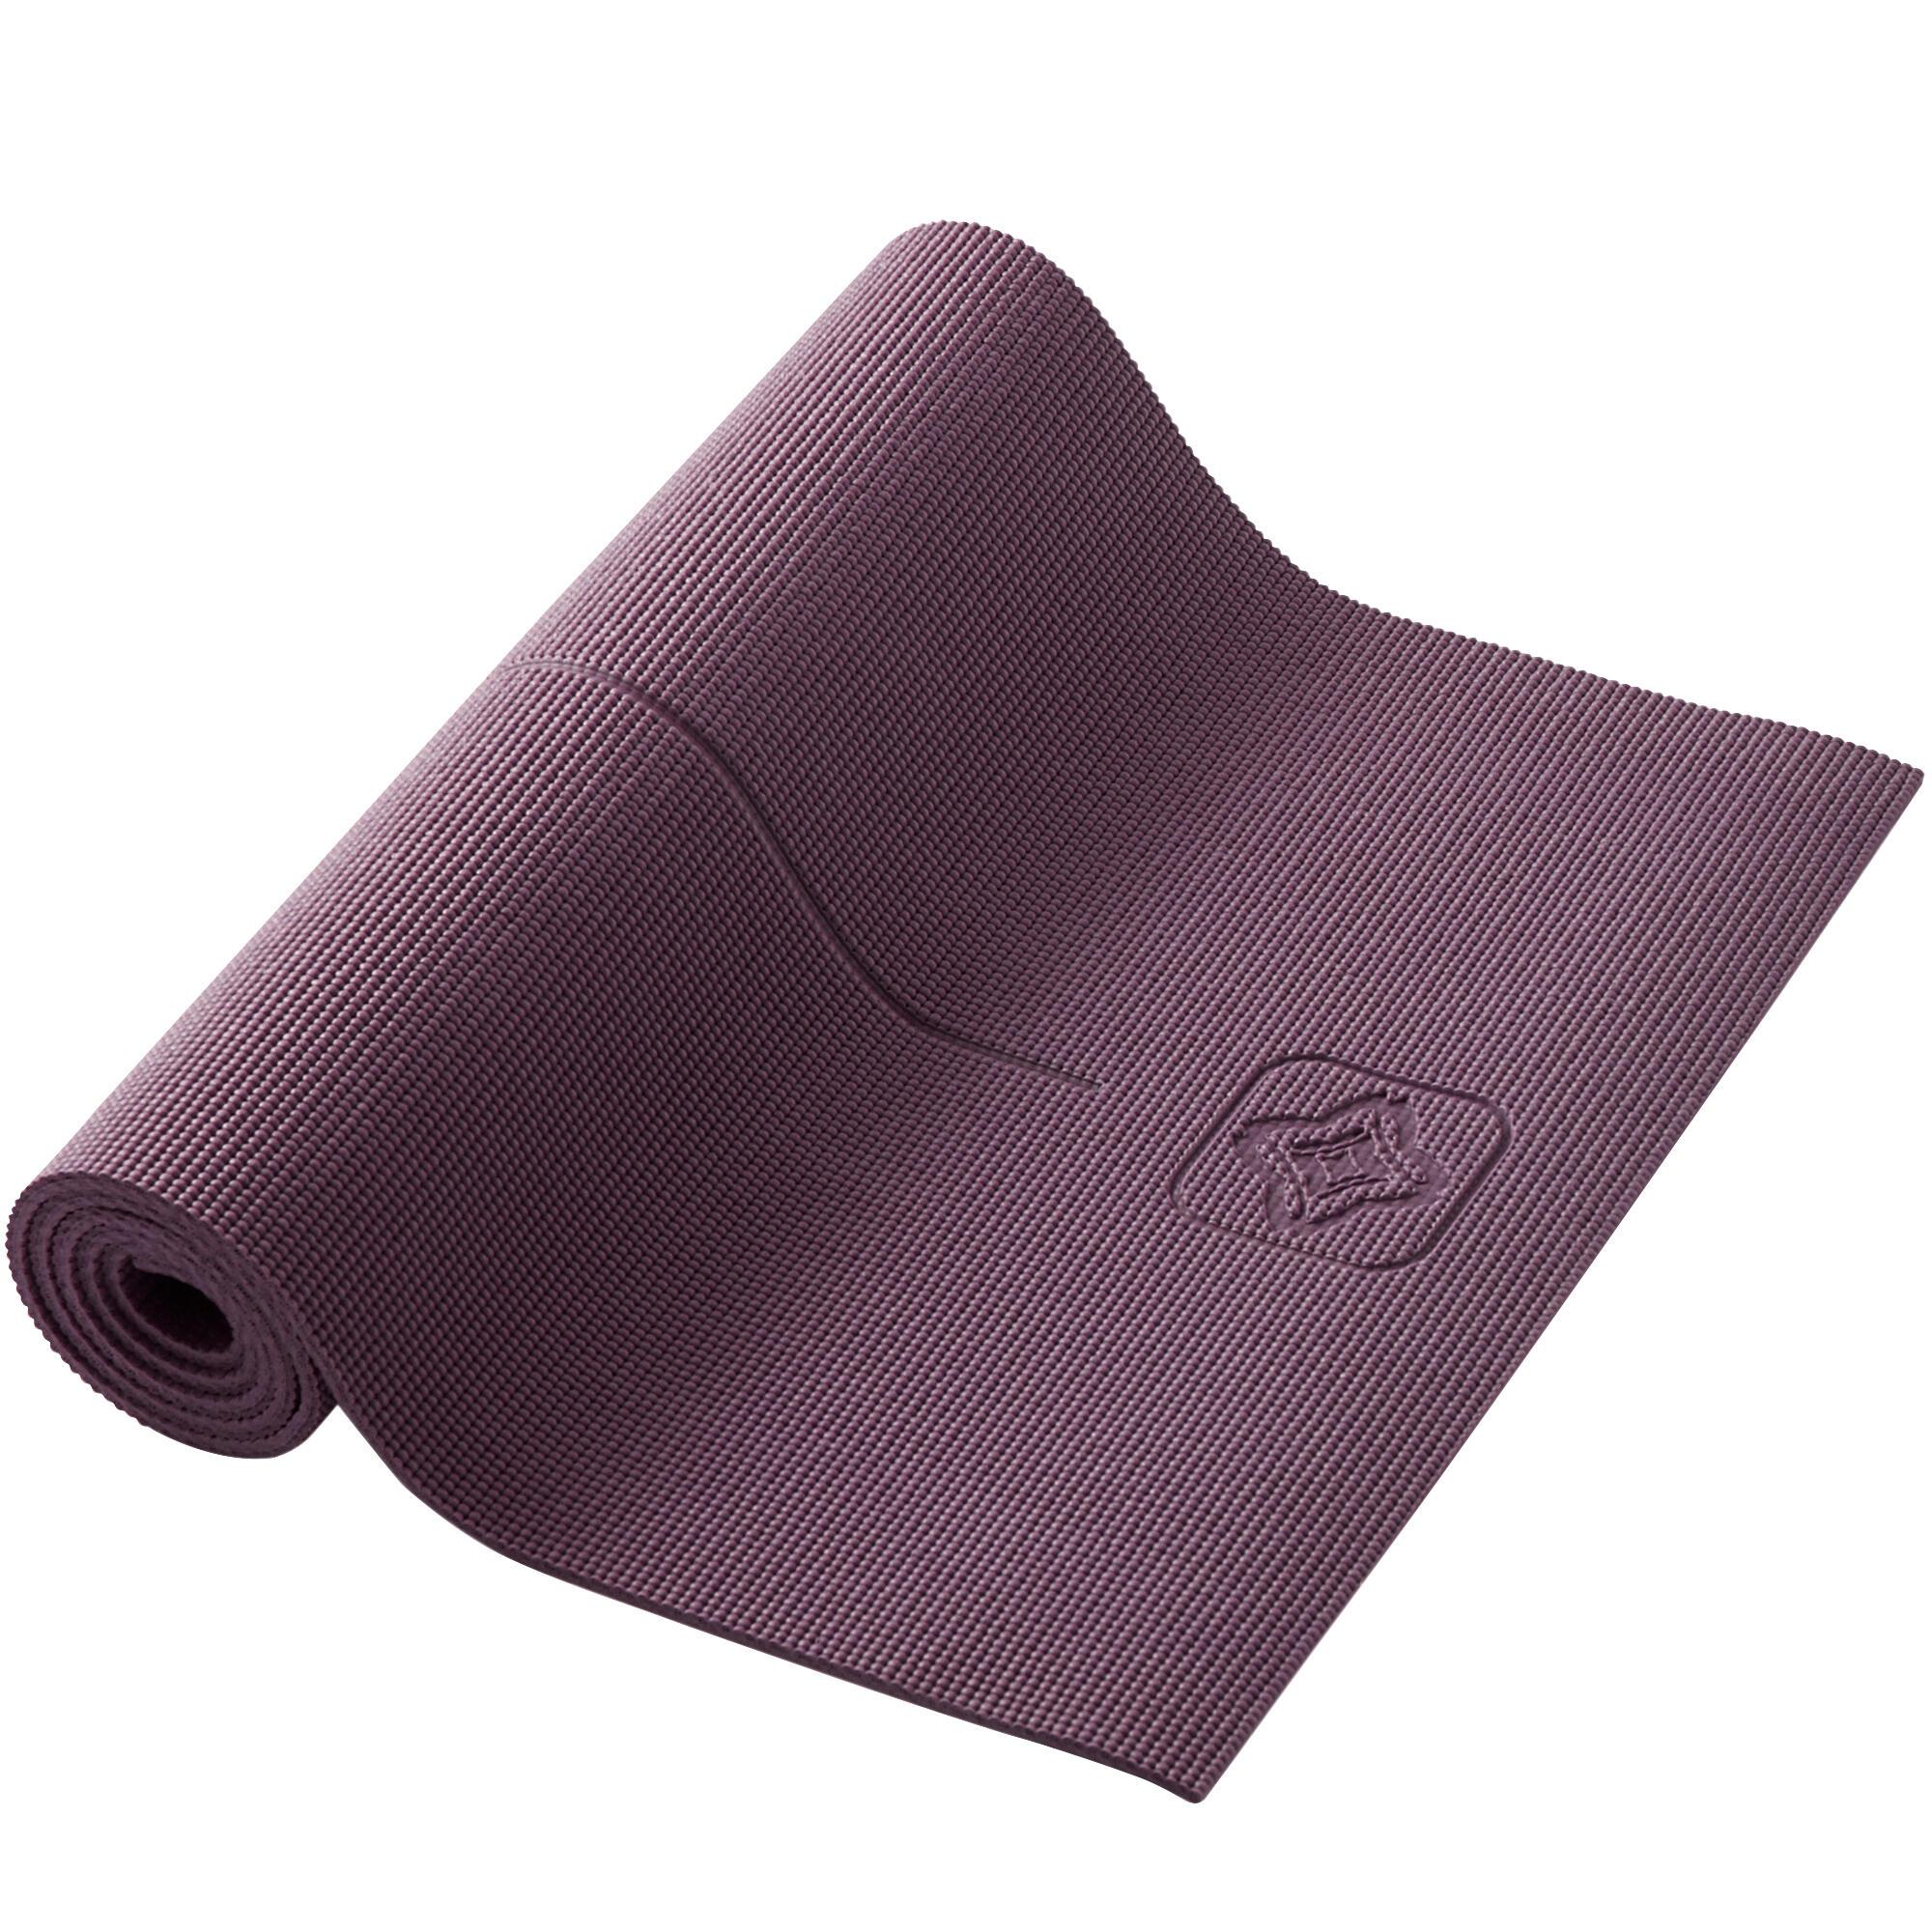 Saltea Yoga 8mm bordo imagine